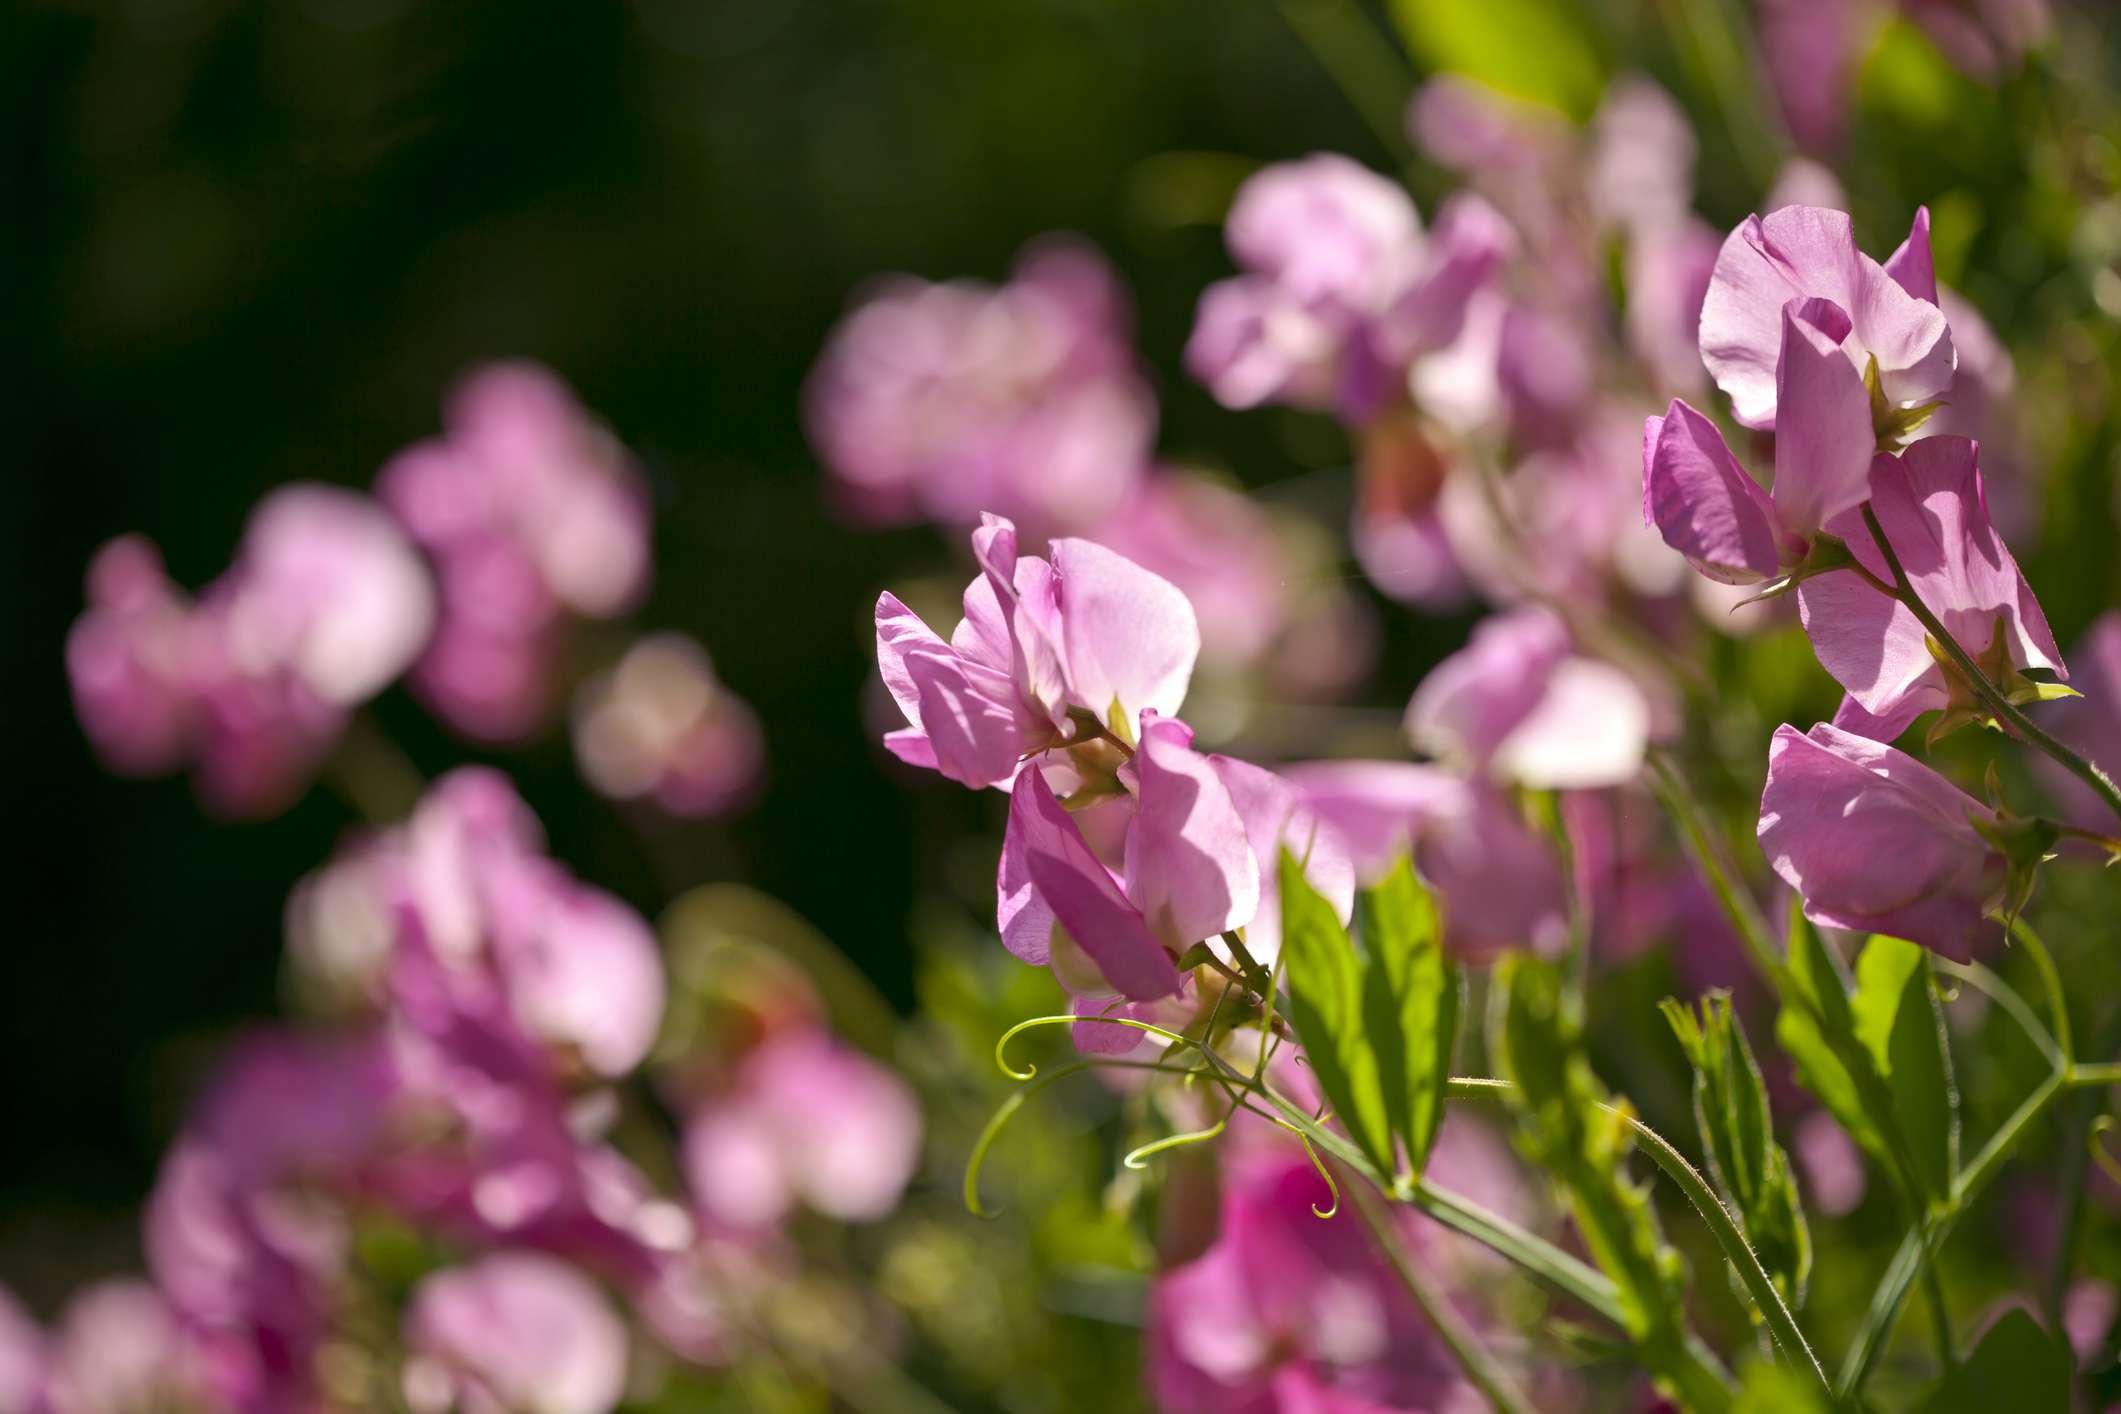 pink sweet pea flowers growing in sunny garden